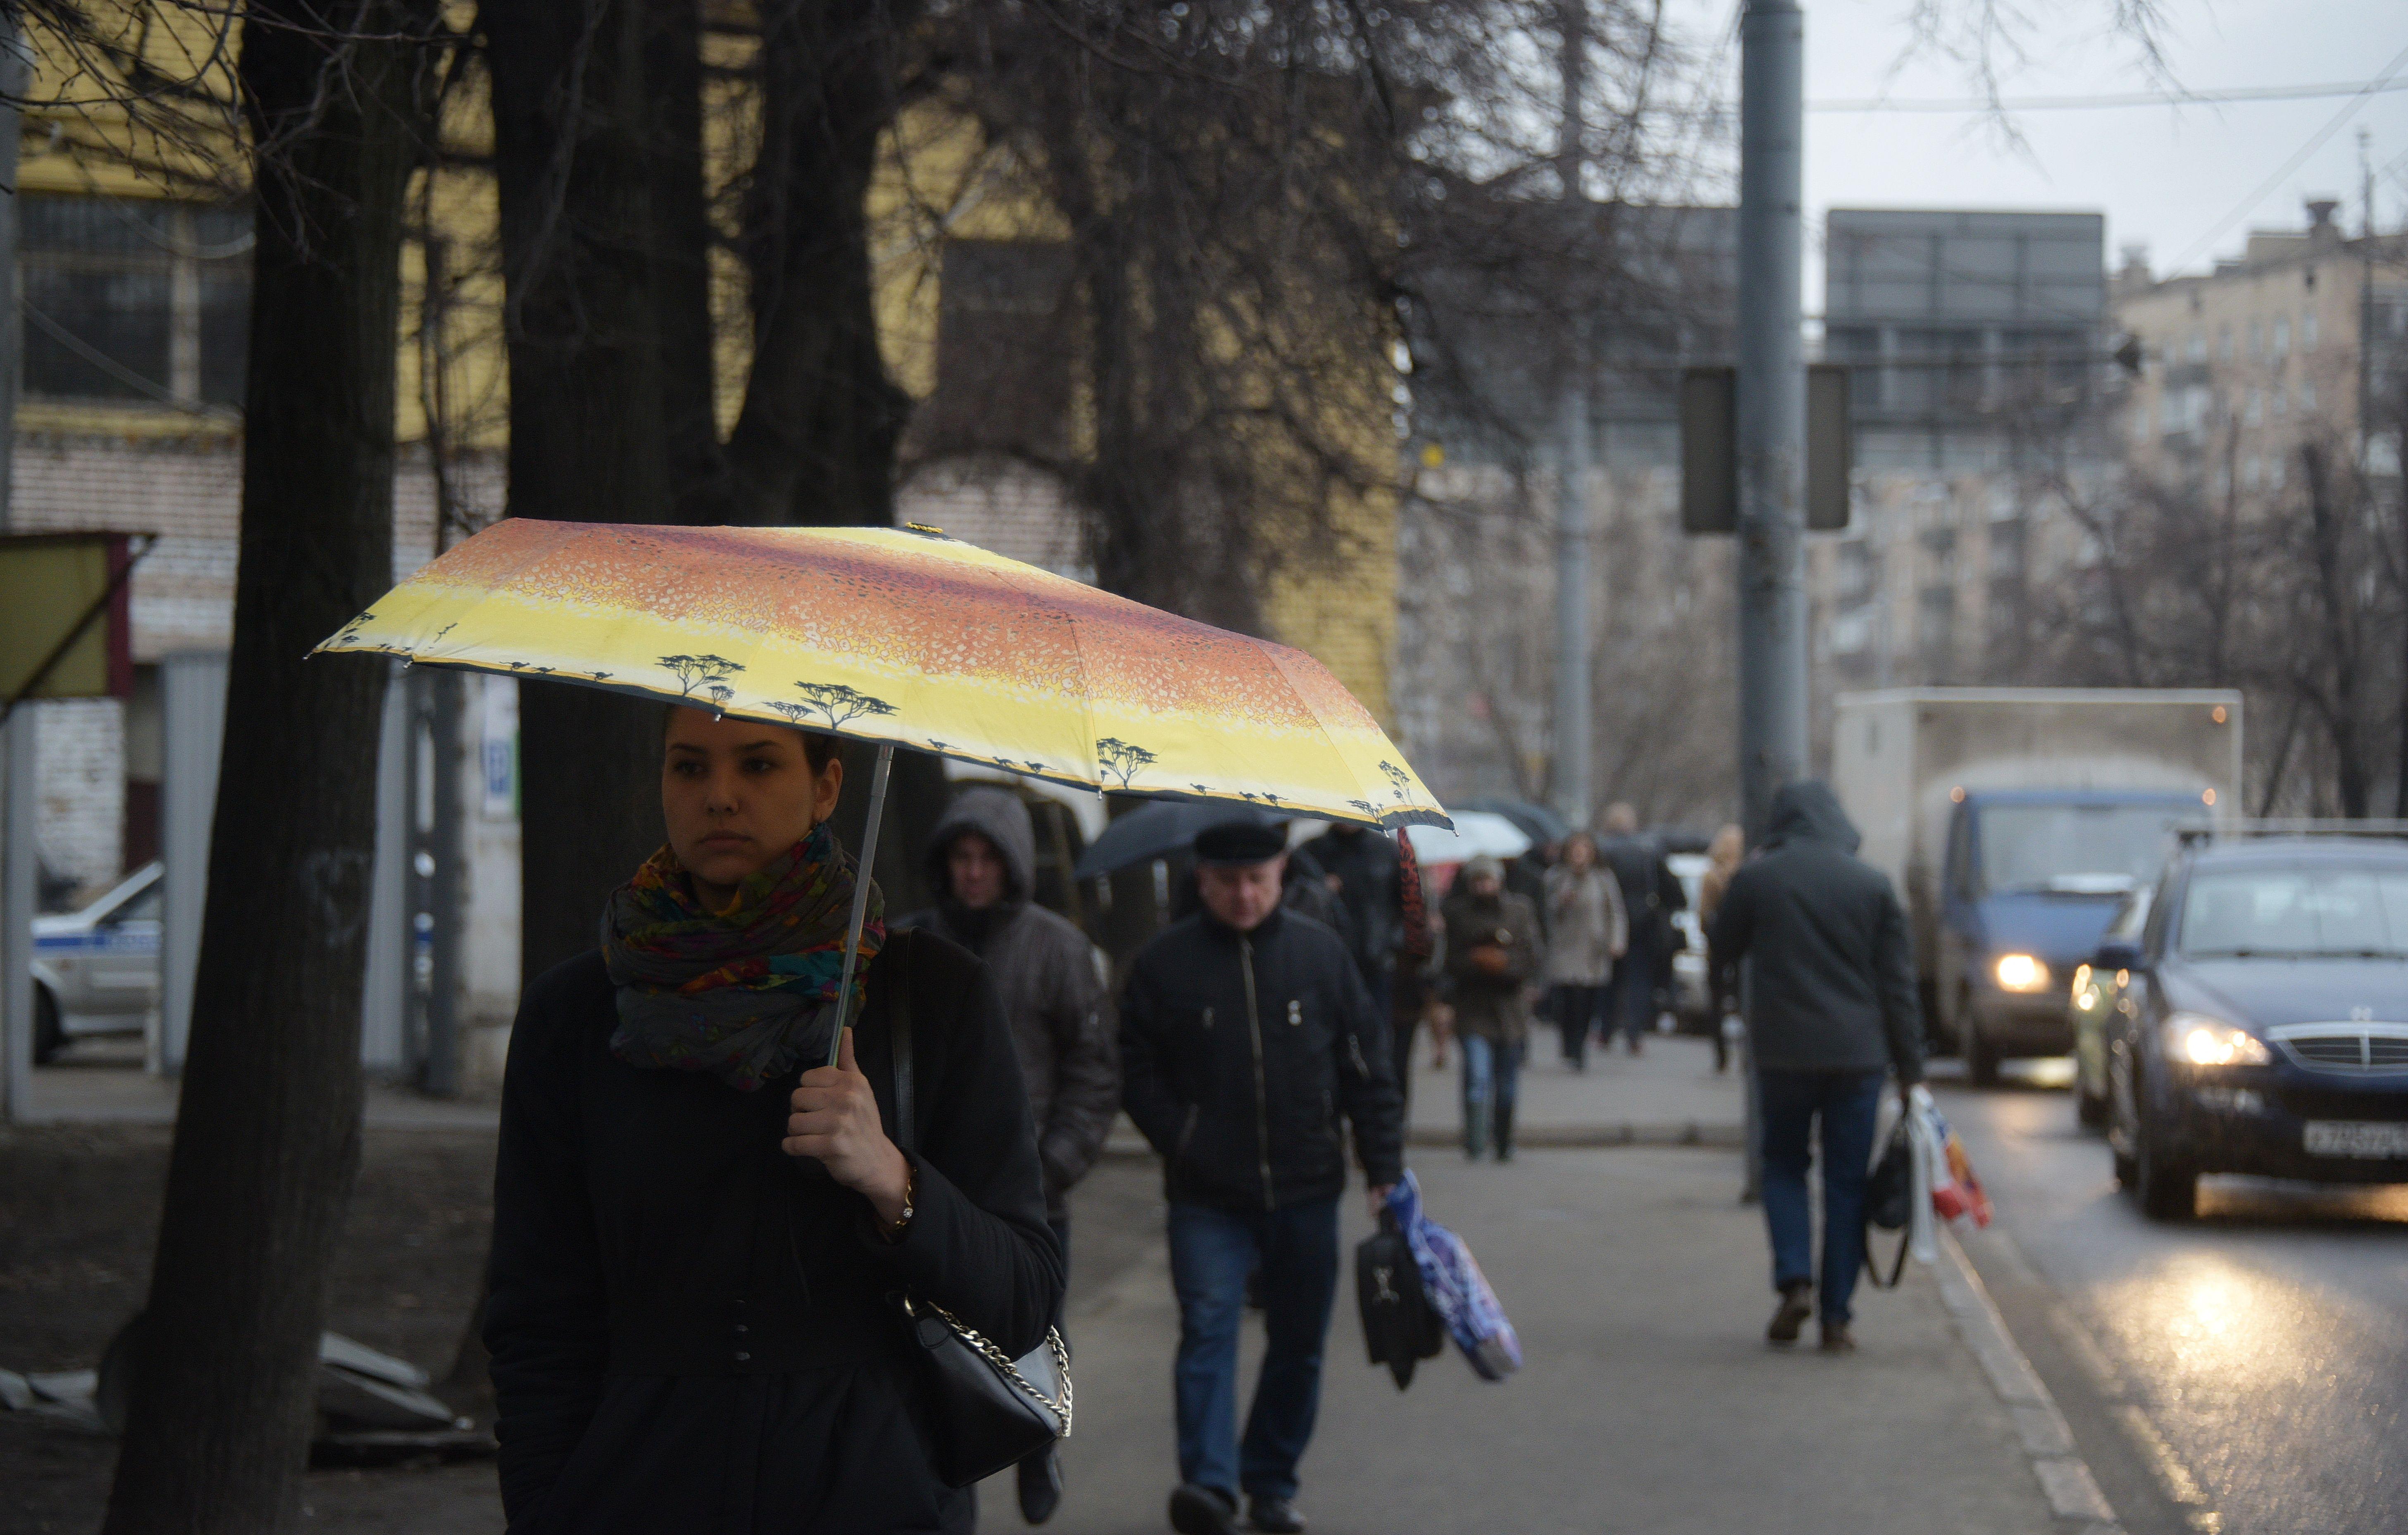 Облачную пятницу пообещали москвичам